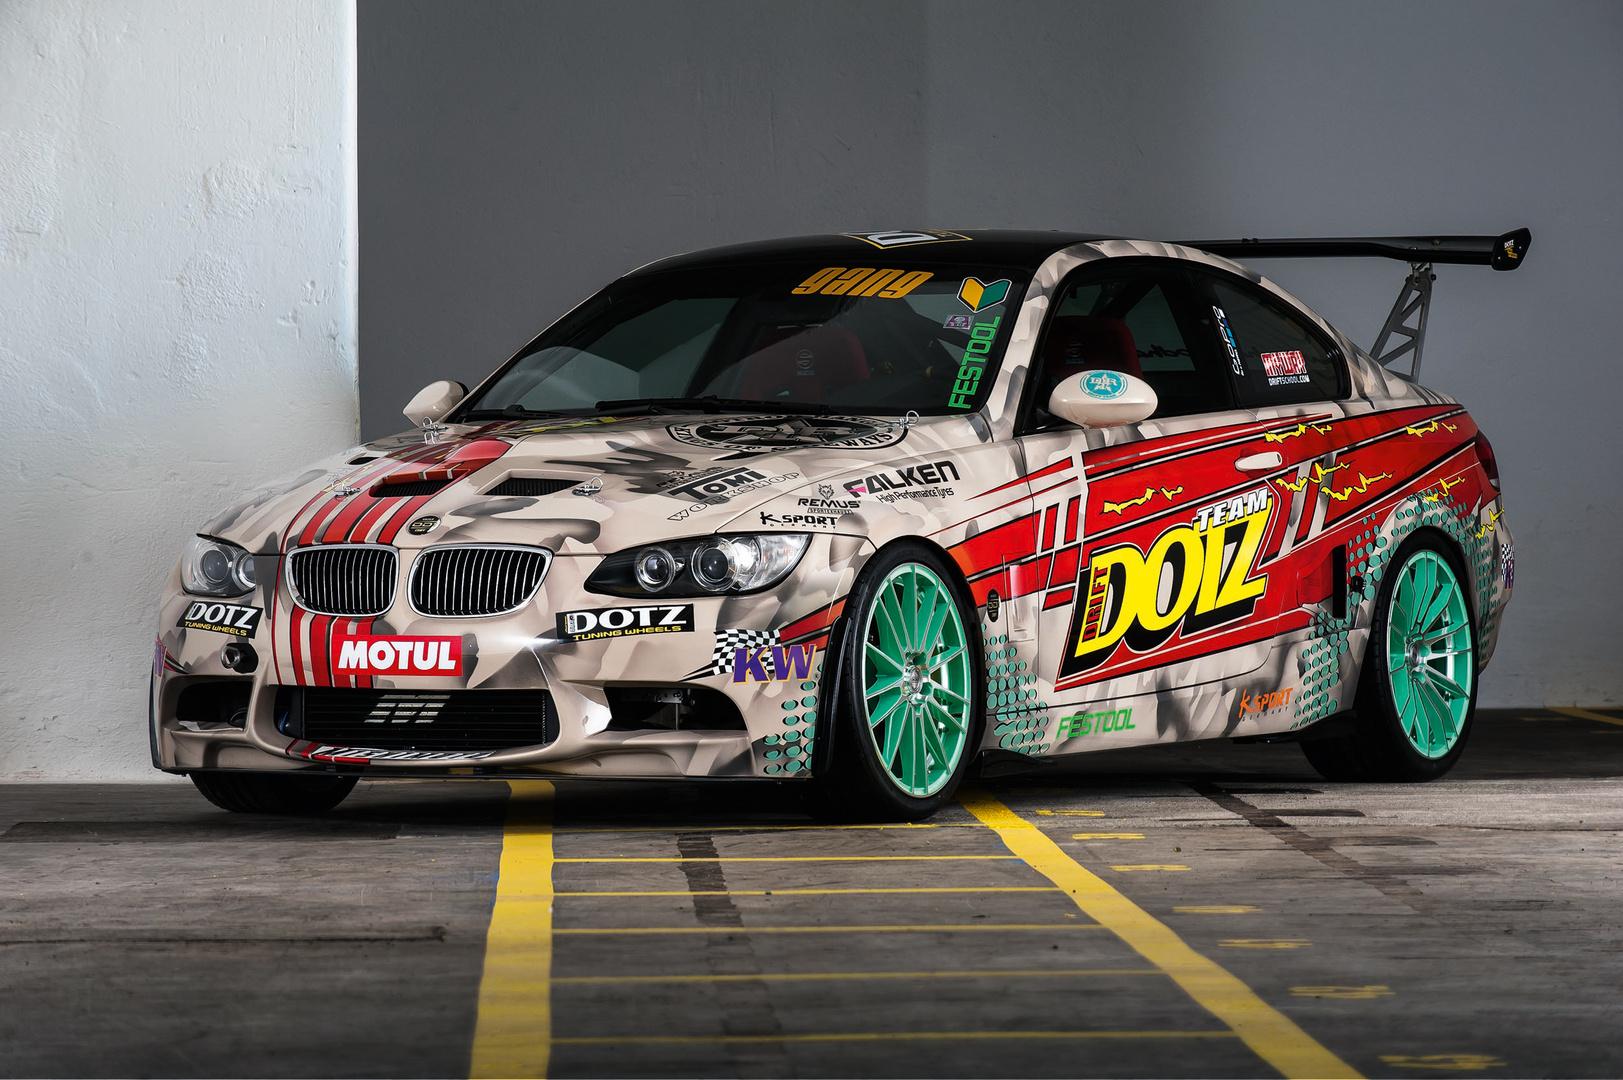 DOTZ BMW E92 DD1- the drift car from DOTZ Kings of sideways